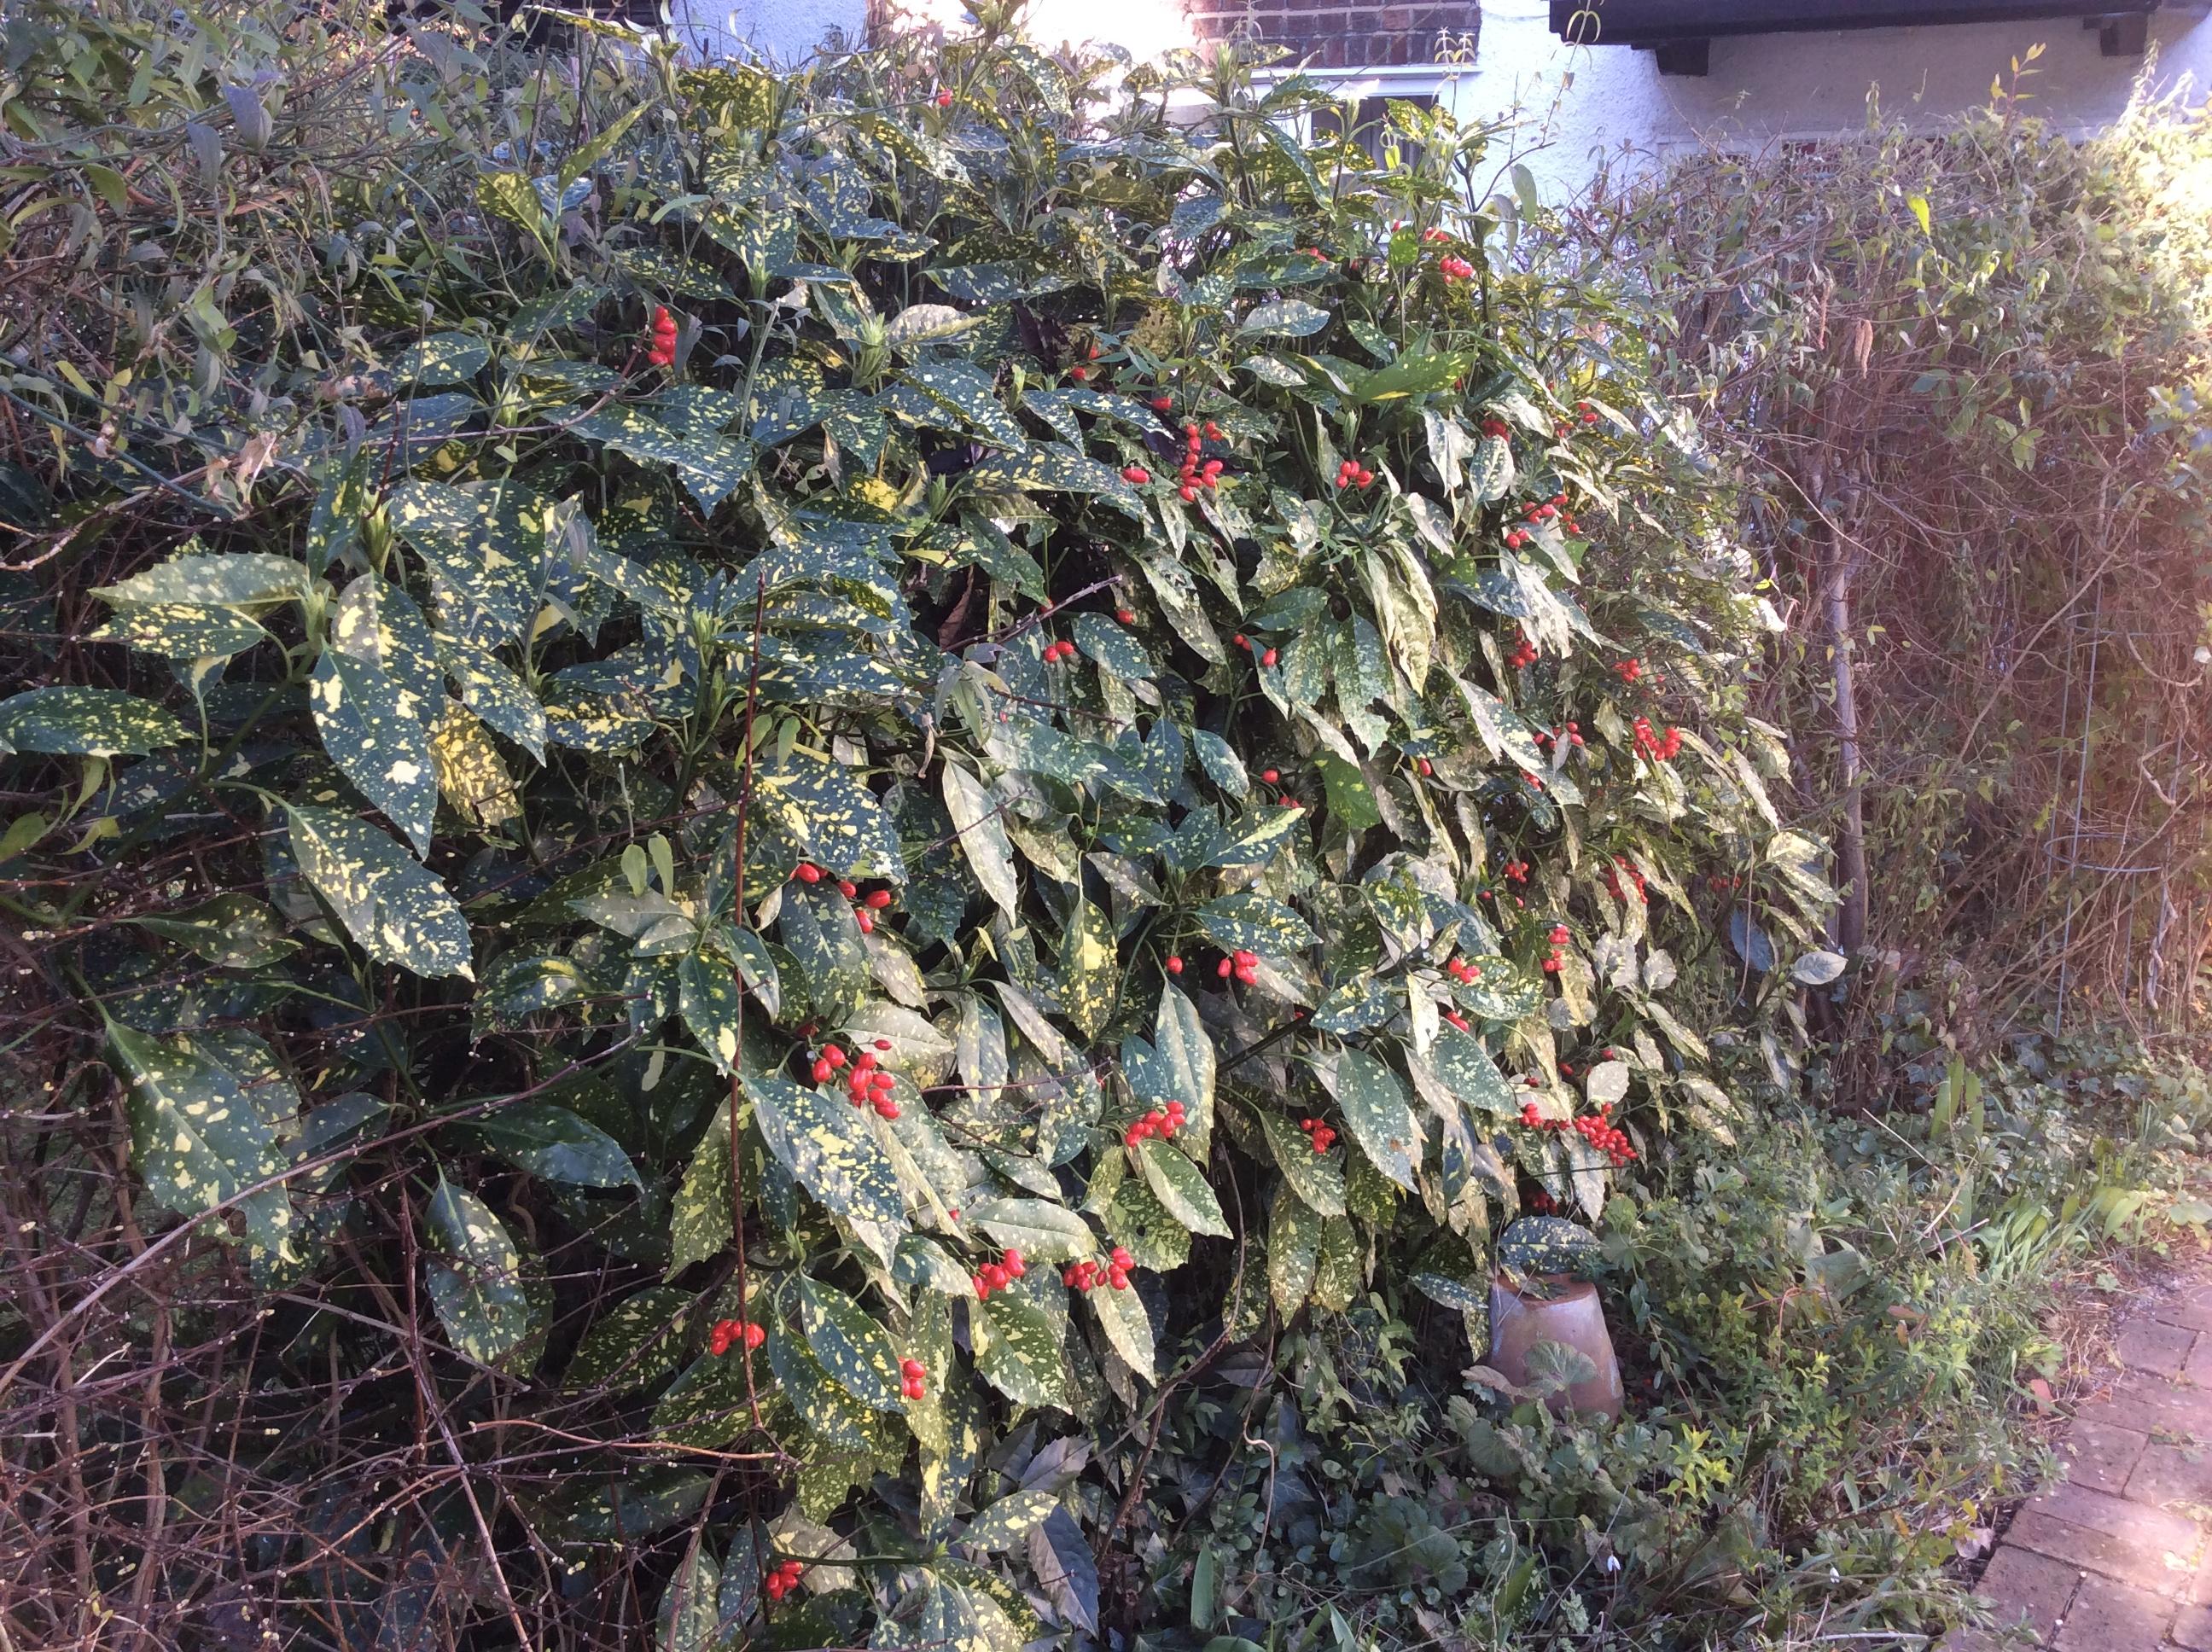 berries on spotted laurel shrub